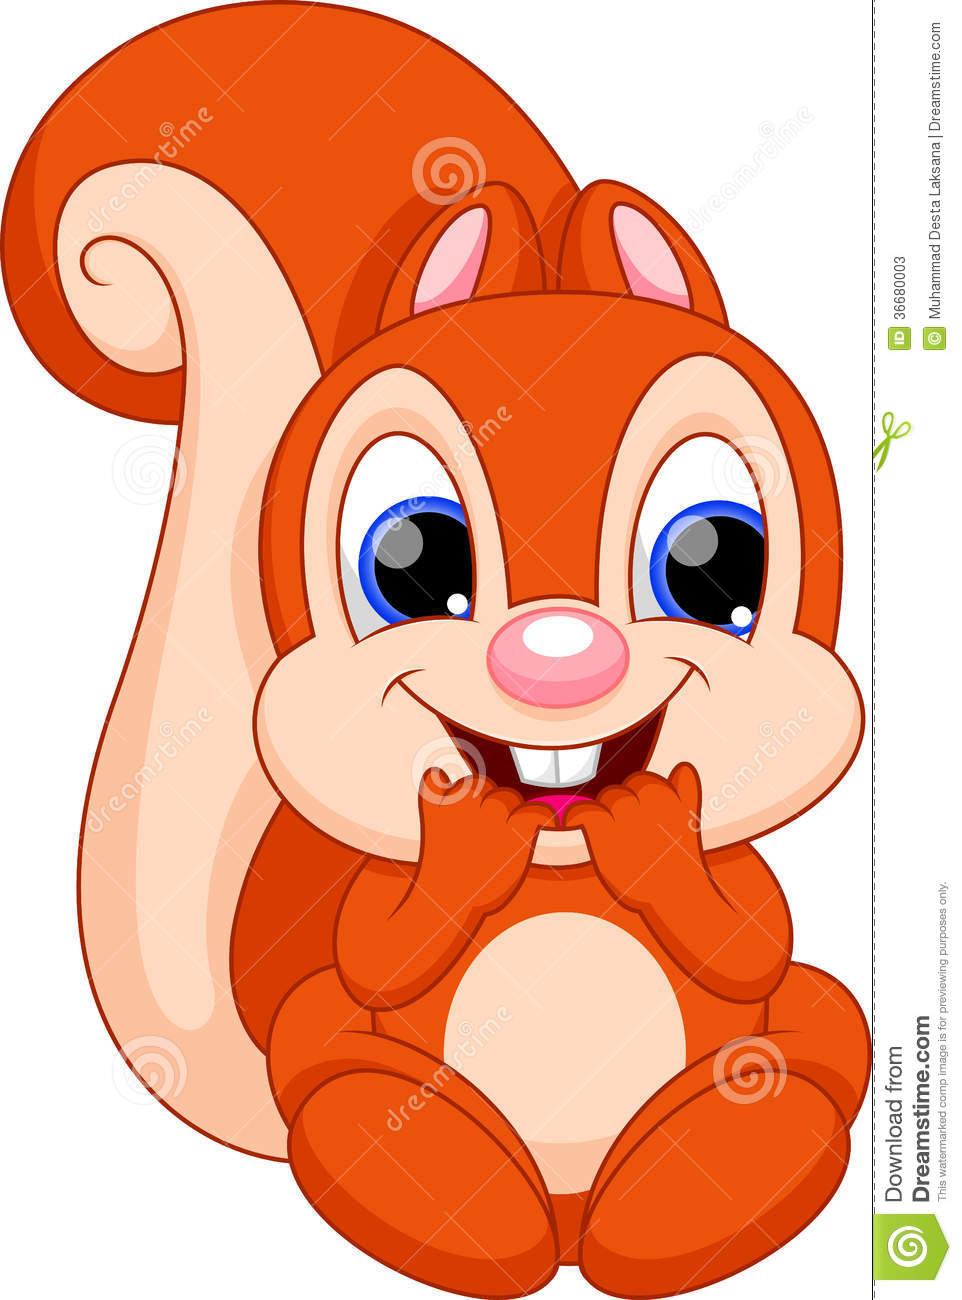 Cute Baby Squirrel Clipart